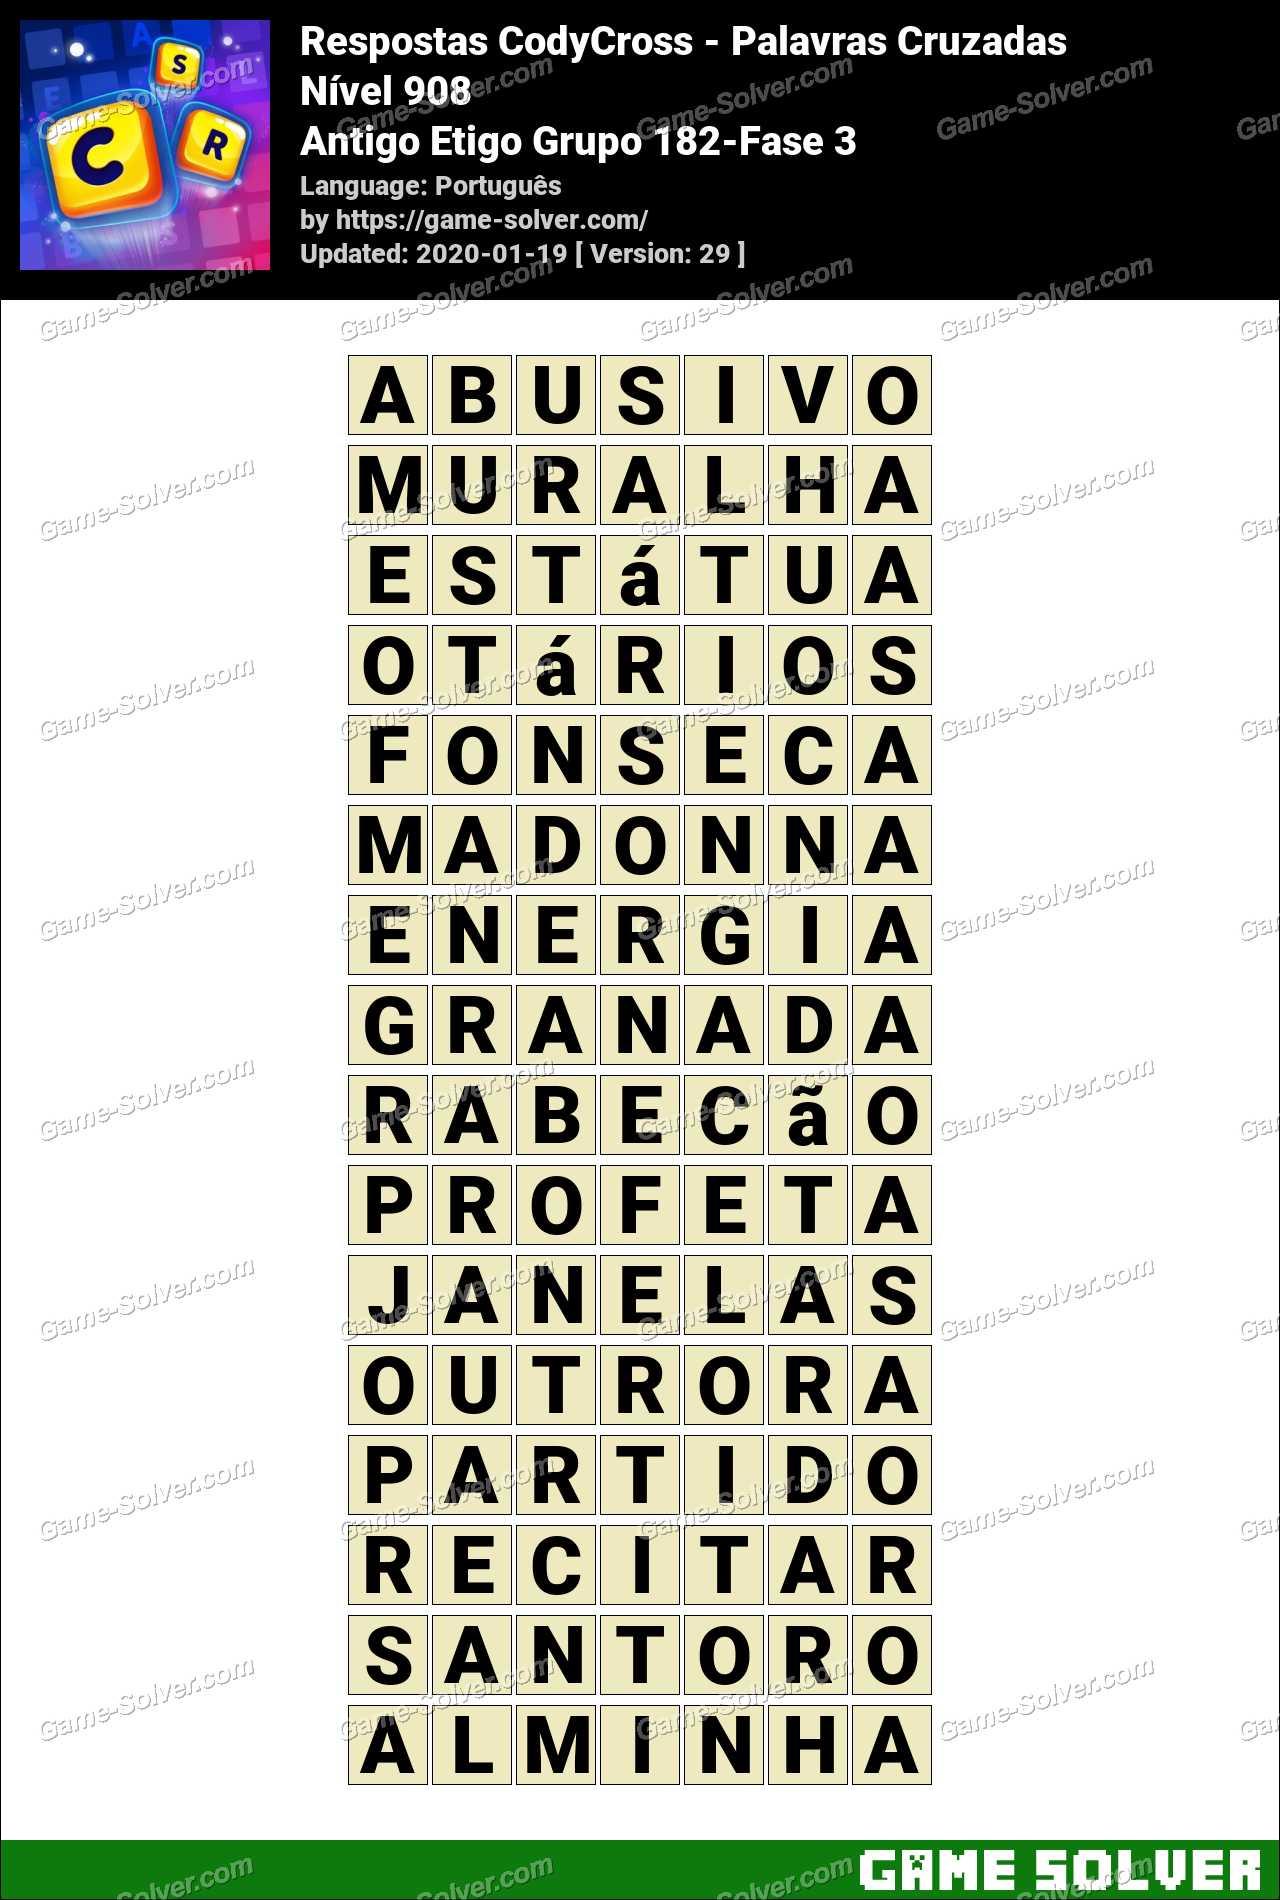 Respostas CodyCross Antigo Etigo Grupo 182-Fase 3